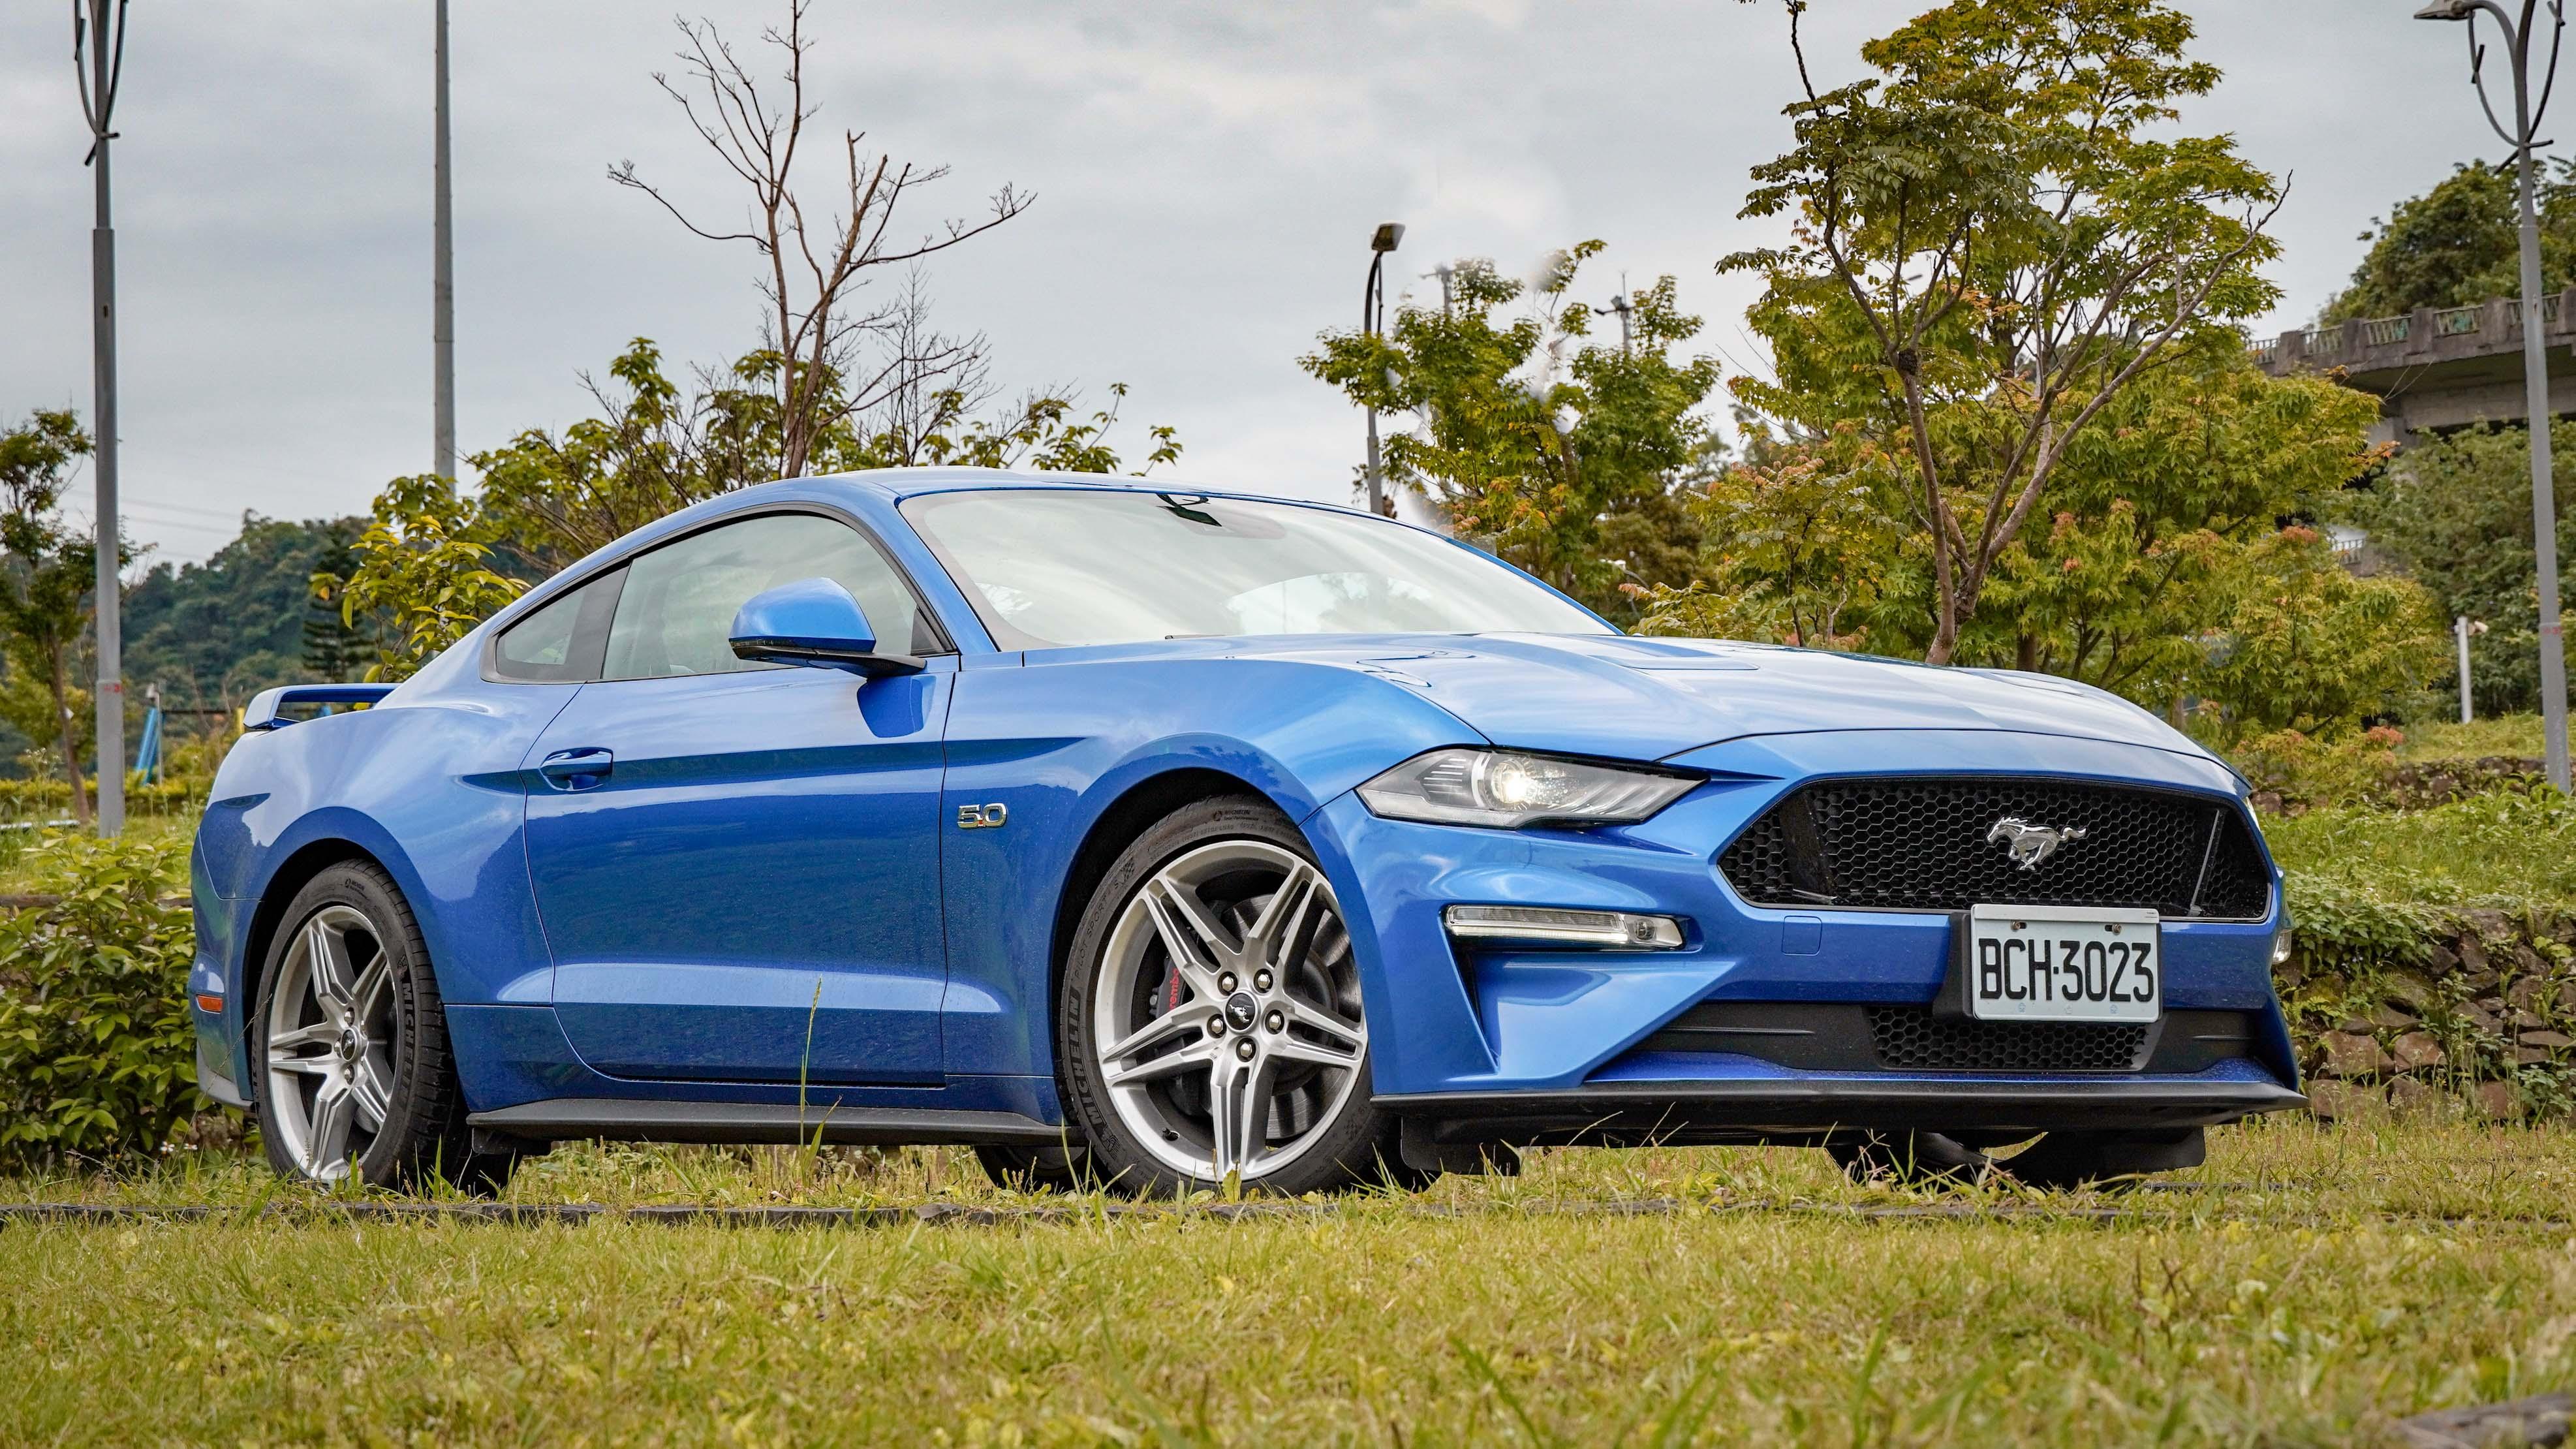 Mustang GT Premium 保留美式跑車大排氣量的原汁原味。